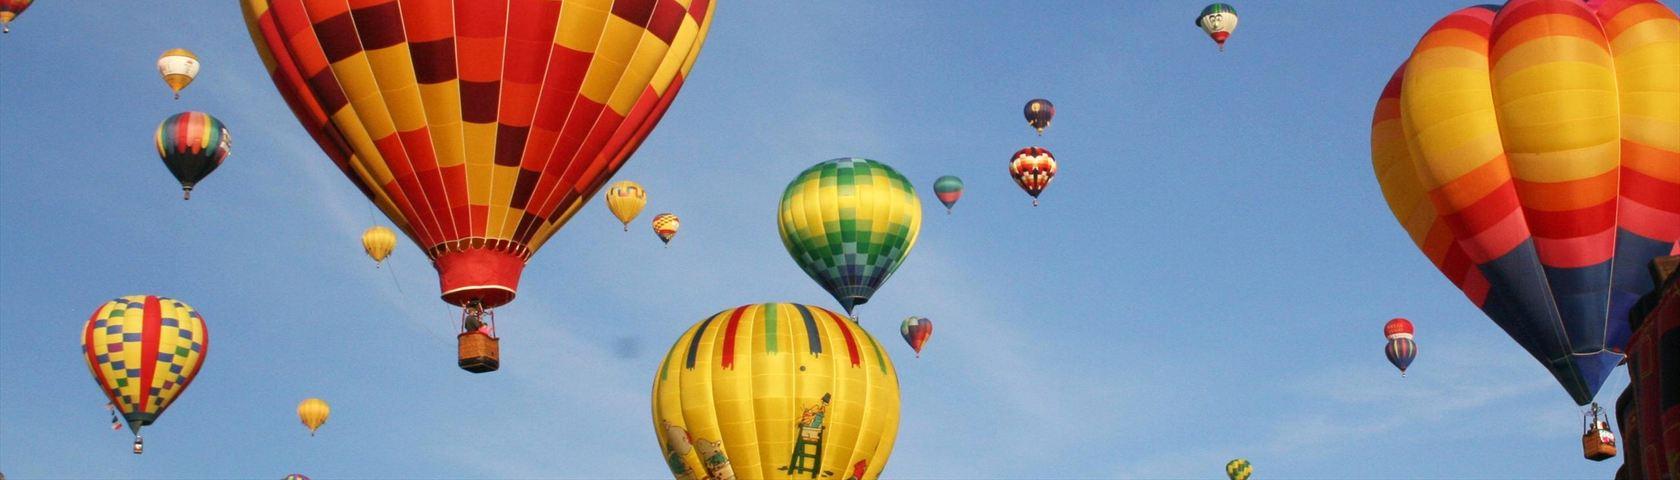 Hot Air Balloons #4